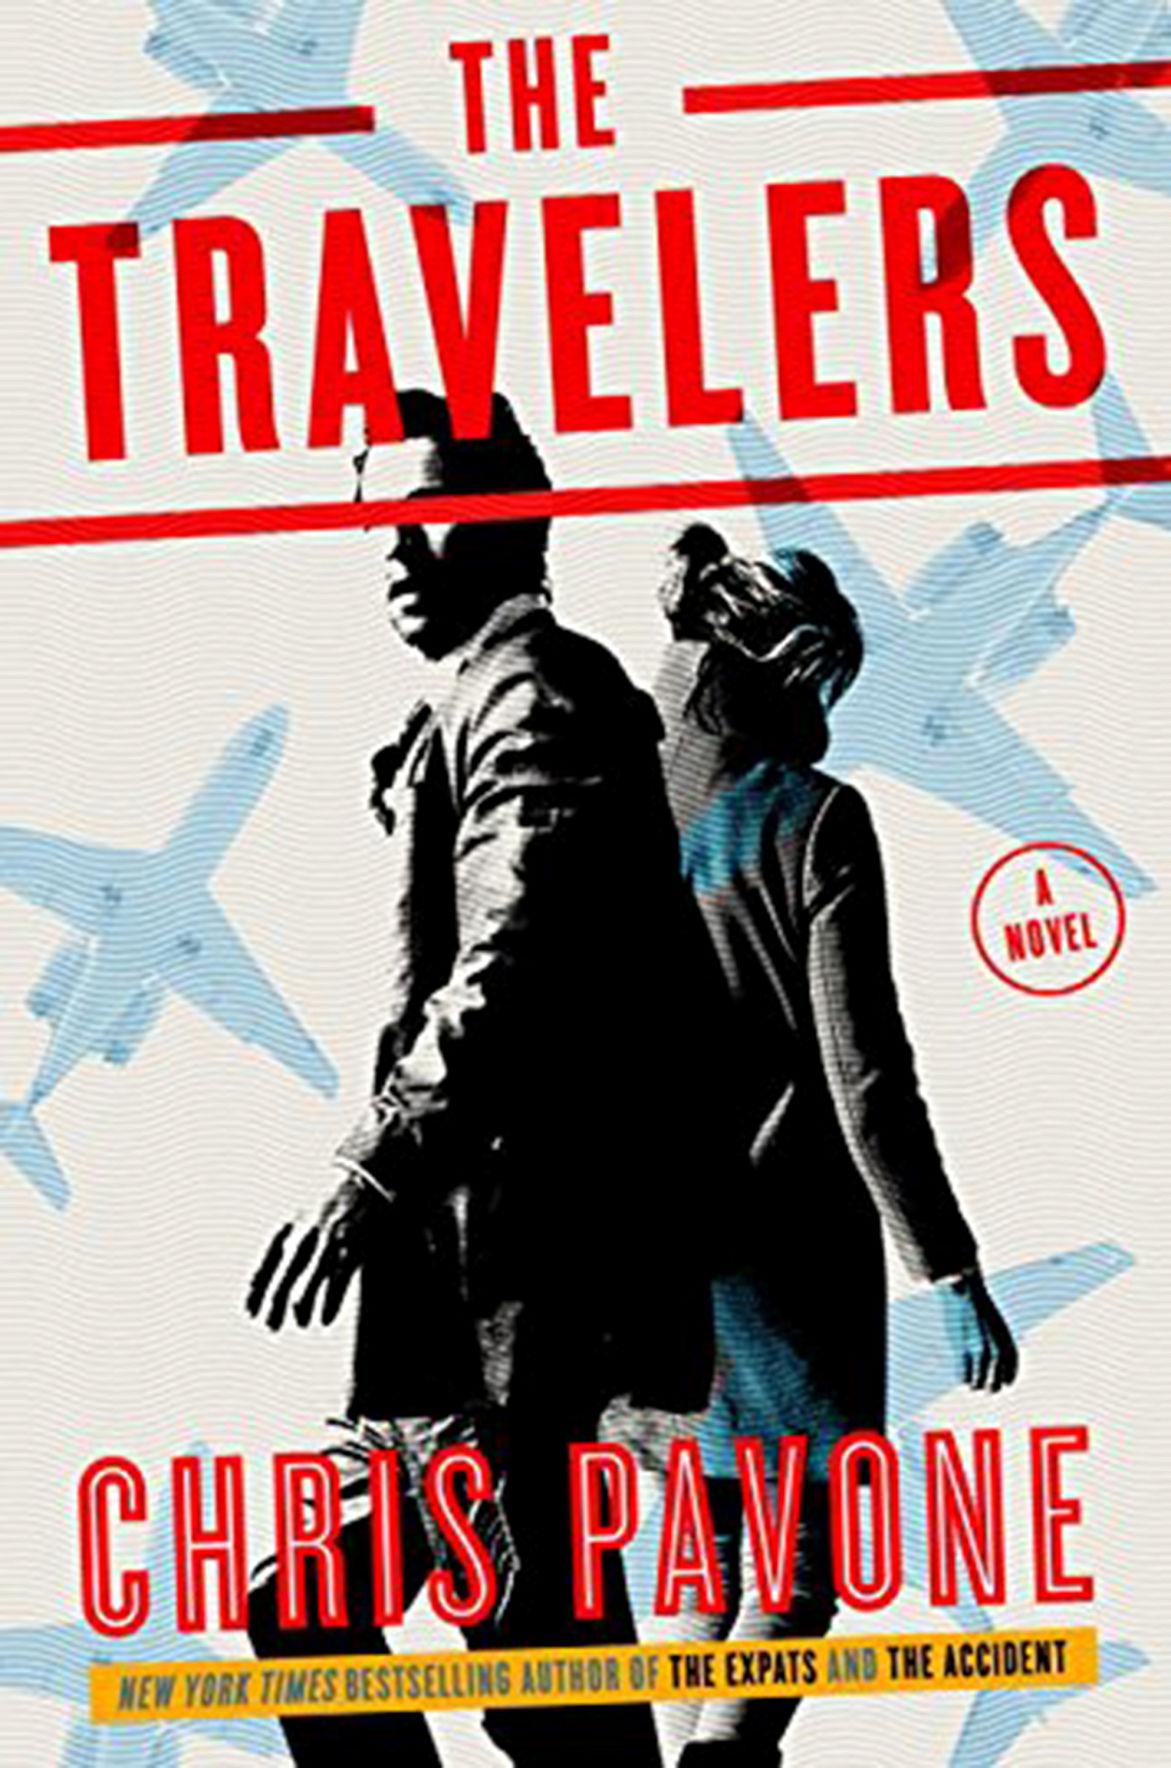 'Travelers' explores secret lives of husband, wife